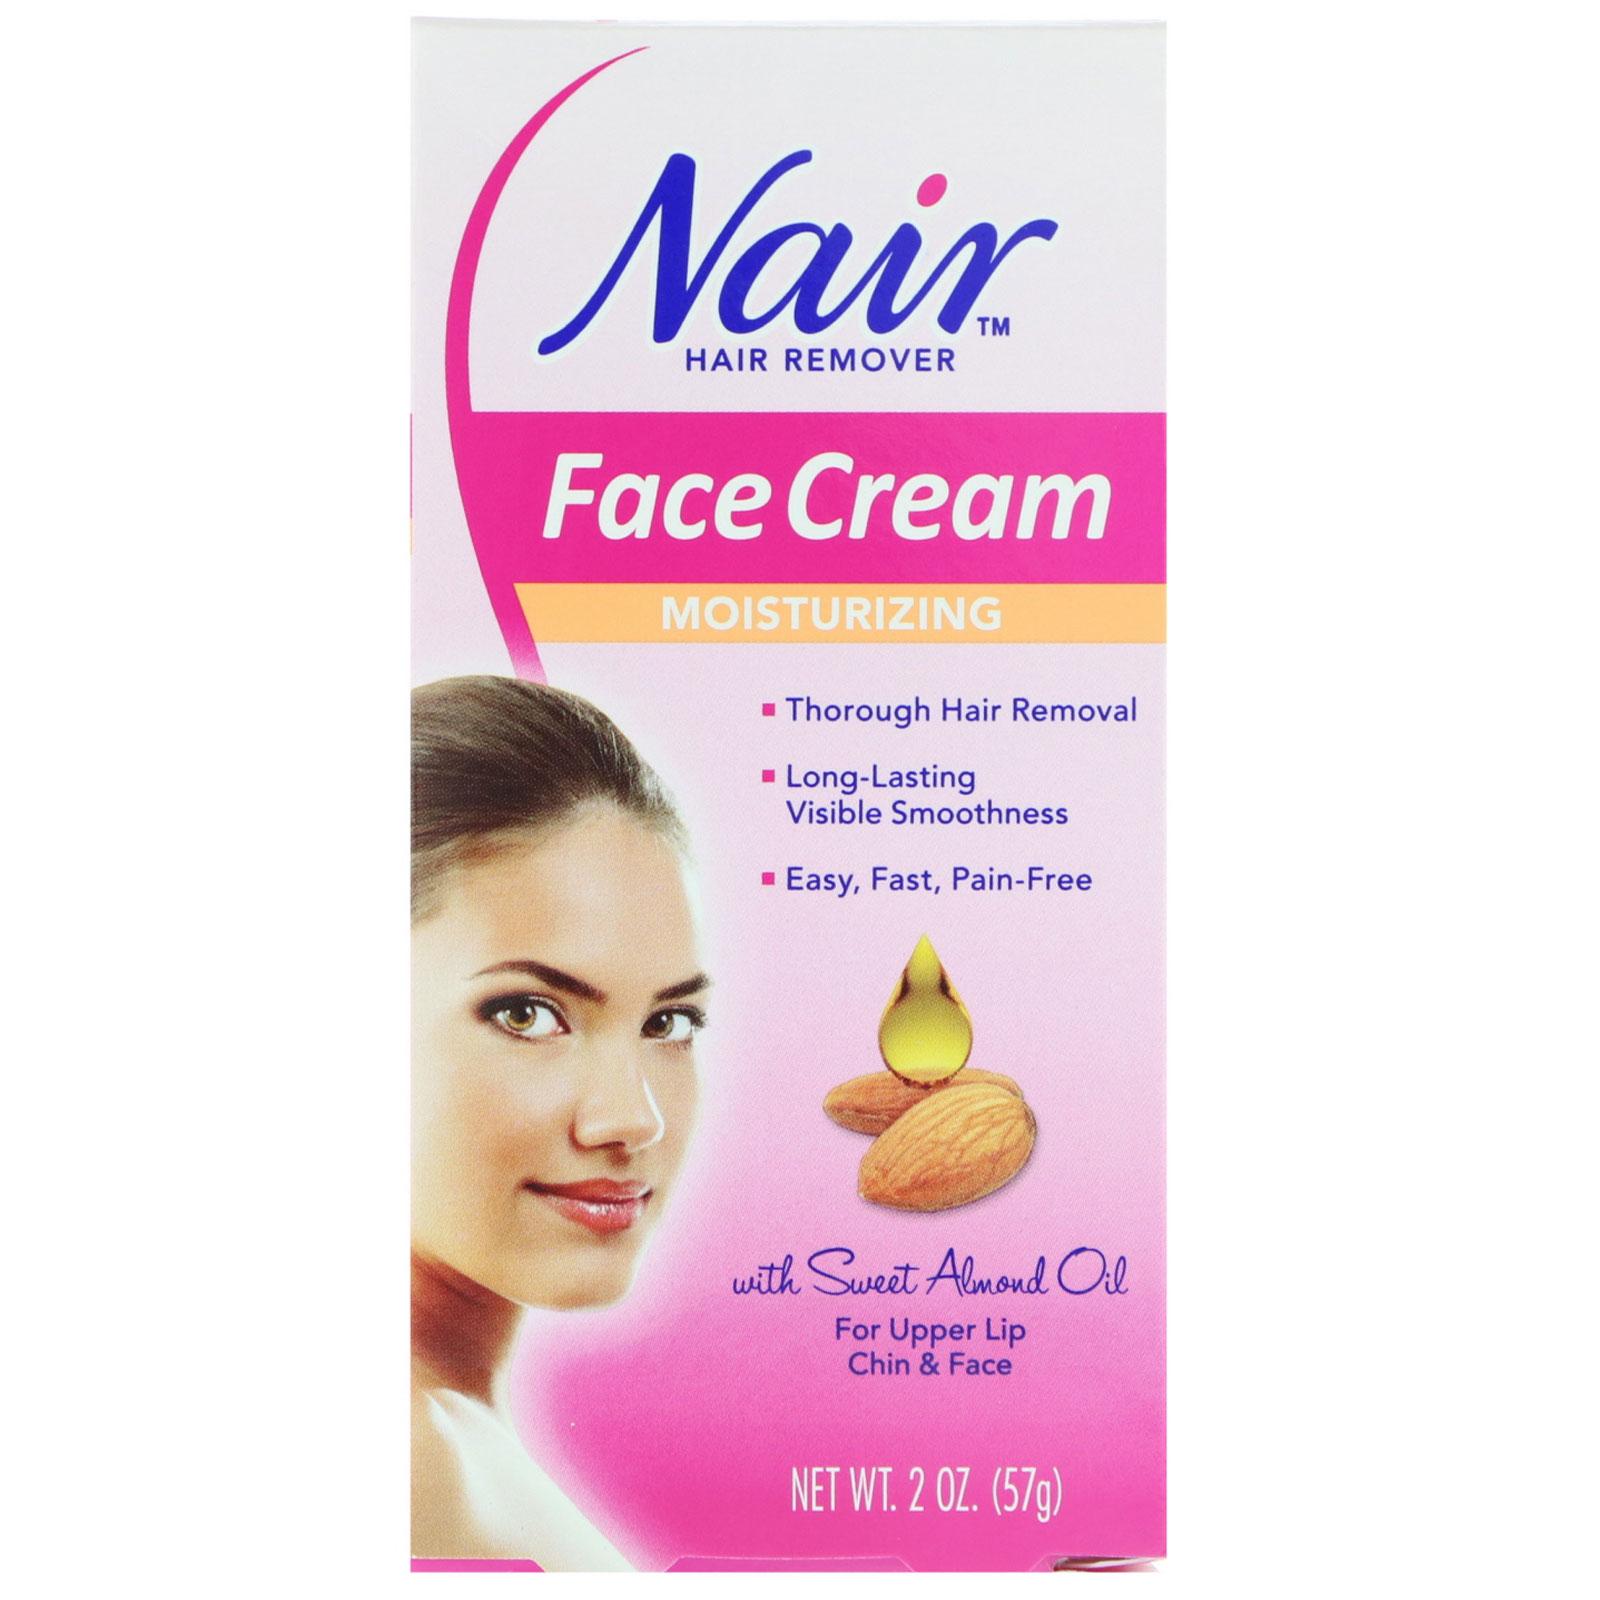 Nair, Hair Remover, Moisturizing Face Cream, 2 oz (57 g)